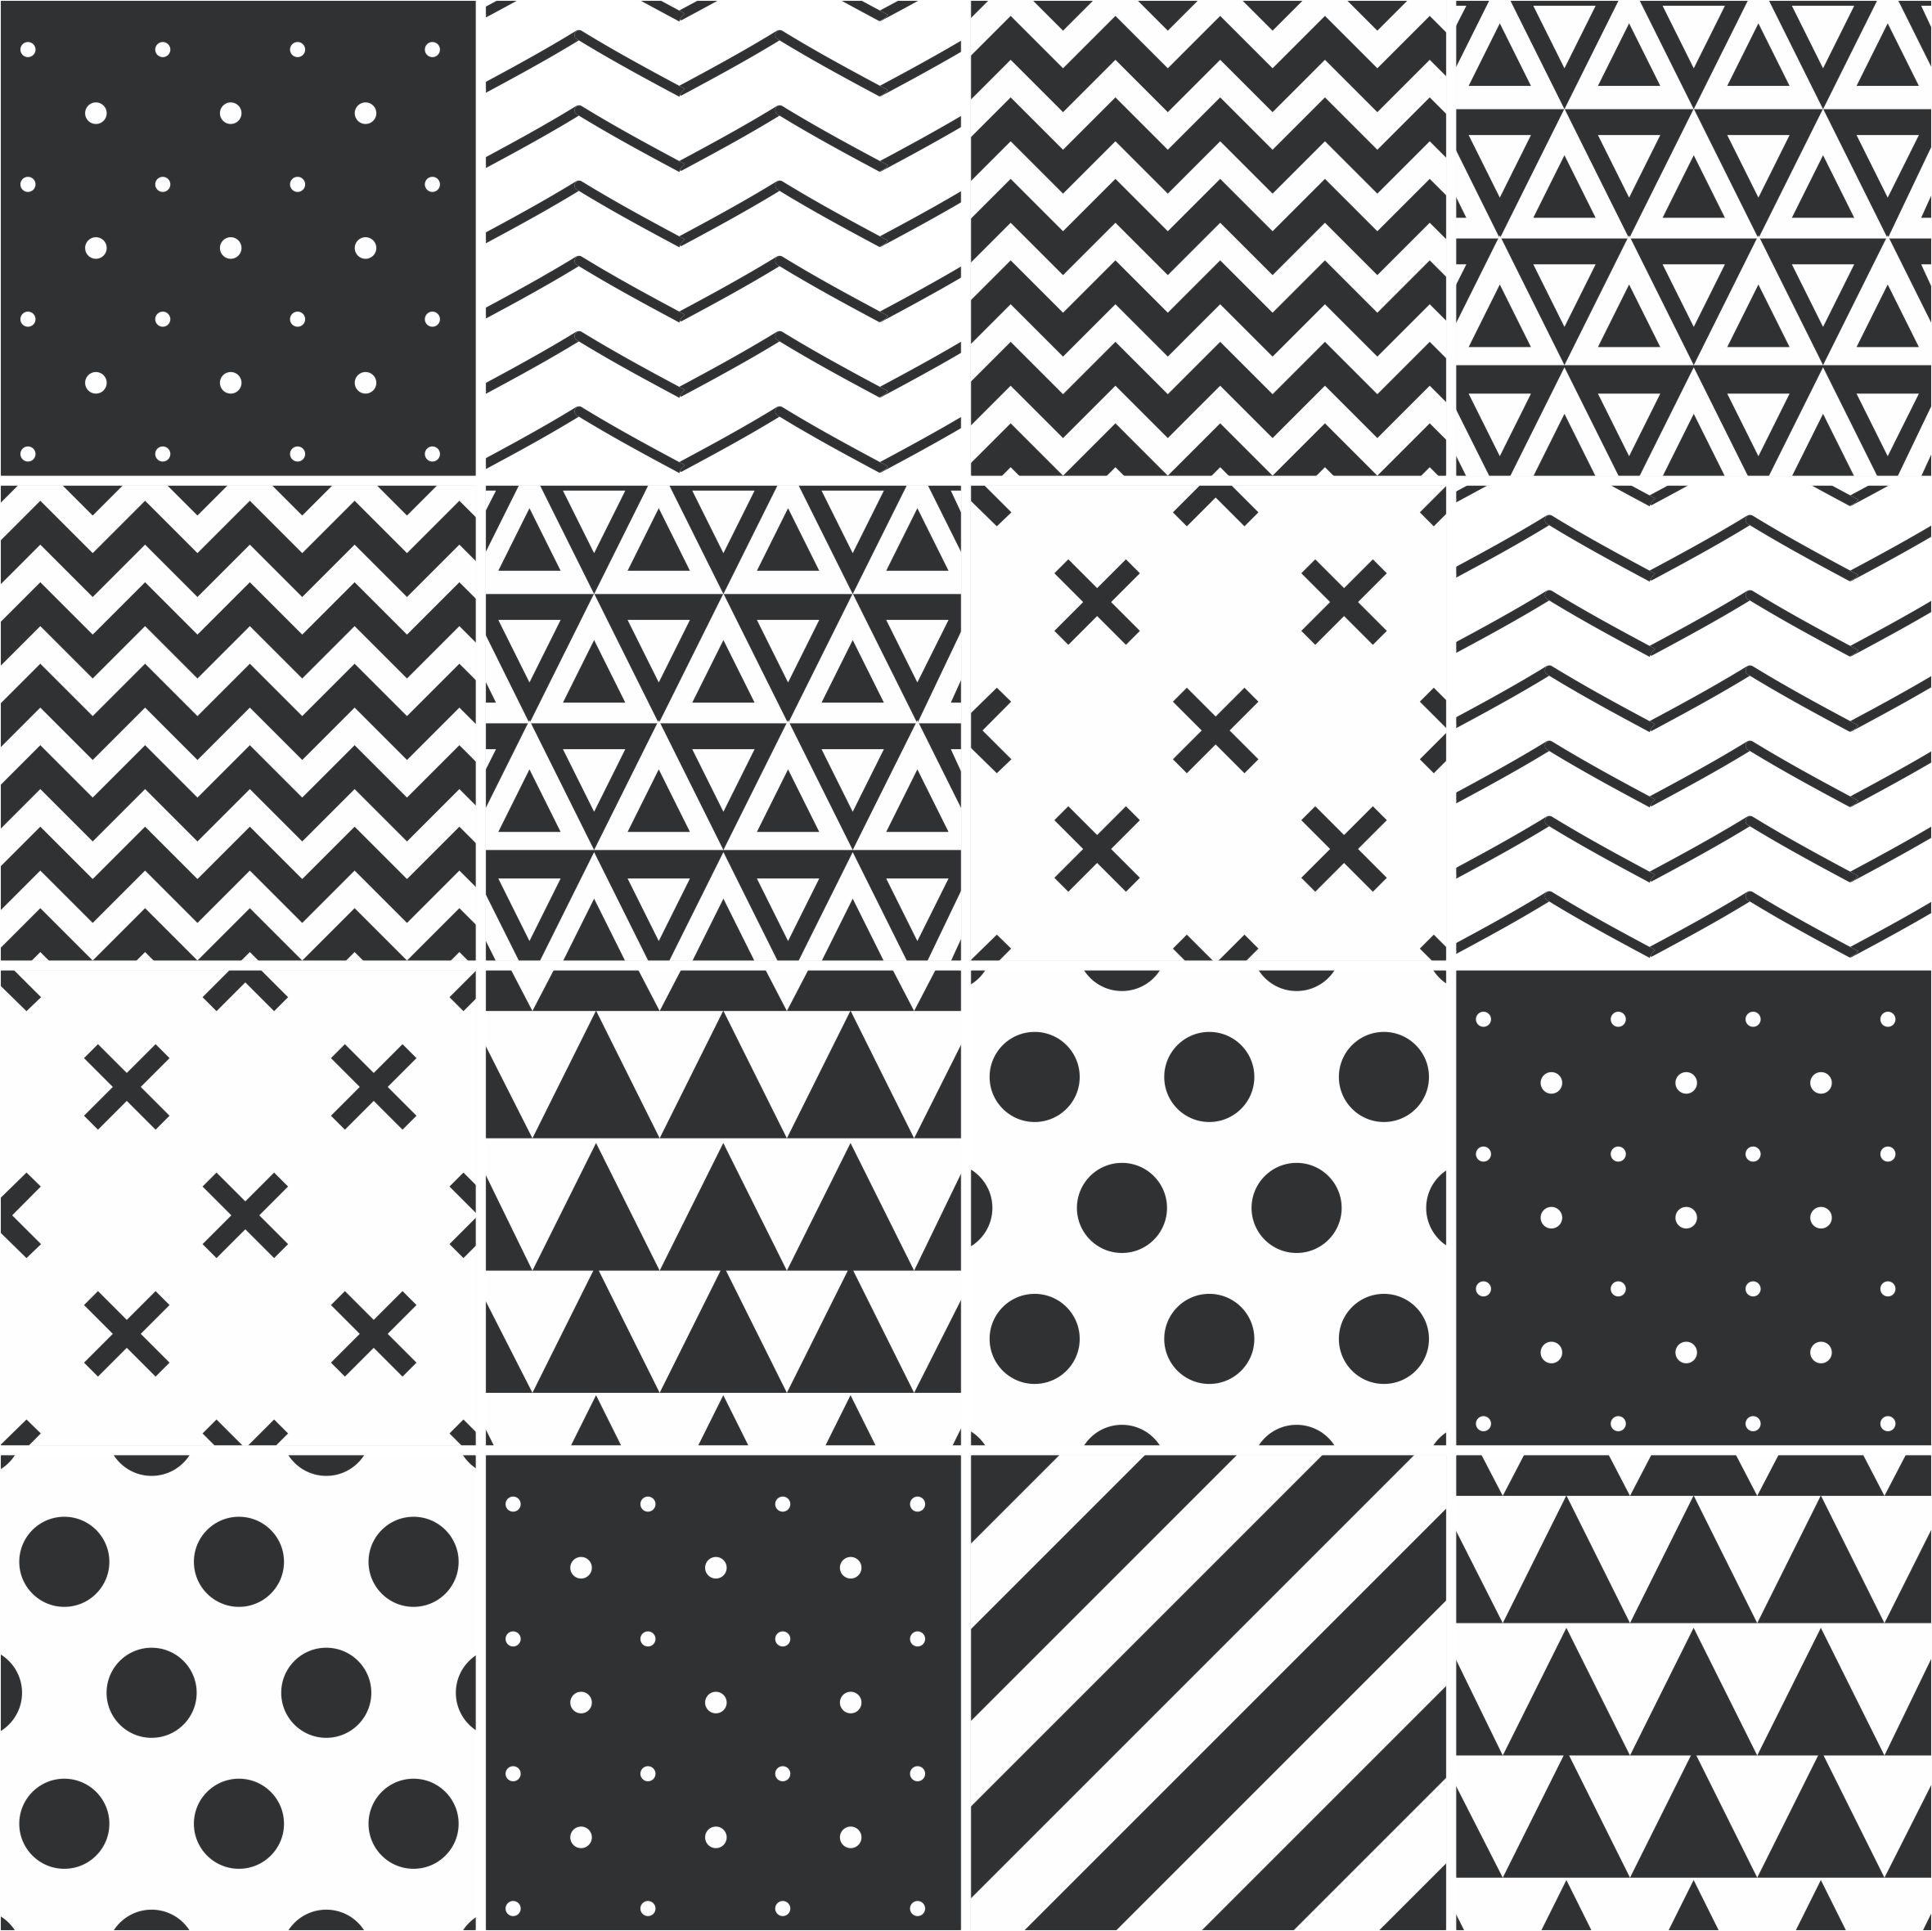 Papel De Parede Adesivo Azulejo Formas Preto E Branco Stickdecor